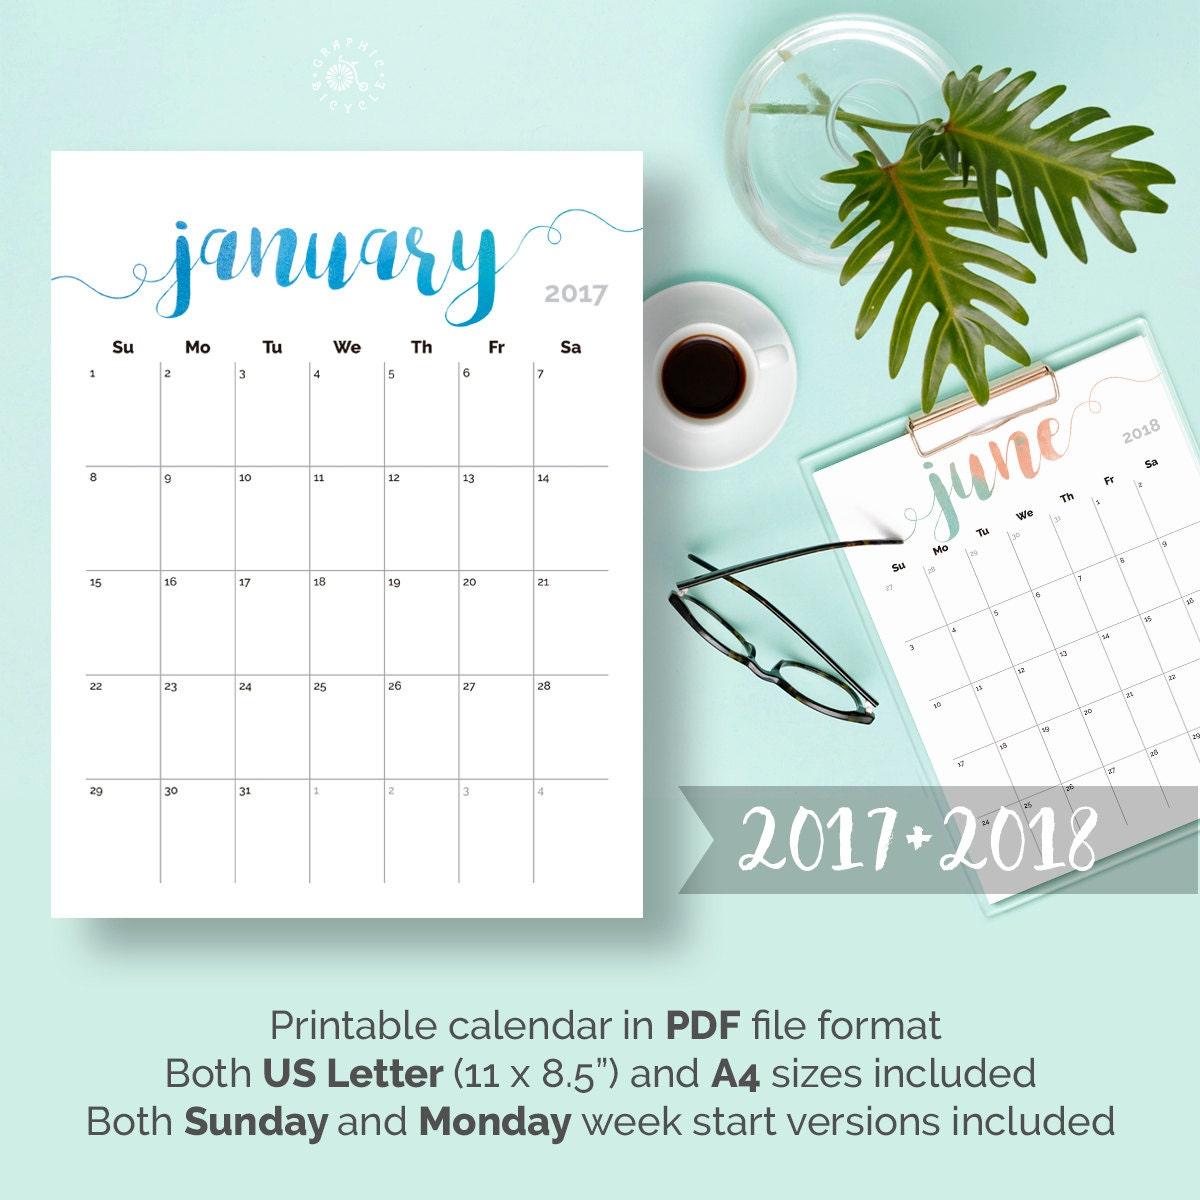 Printable Monthly Calendars 2018: 2017 2018 Calendar PRINTABLE Desk Calendar Planner Watercolor